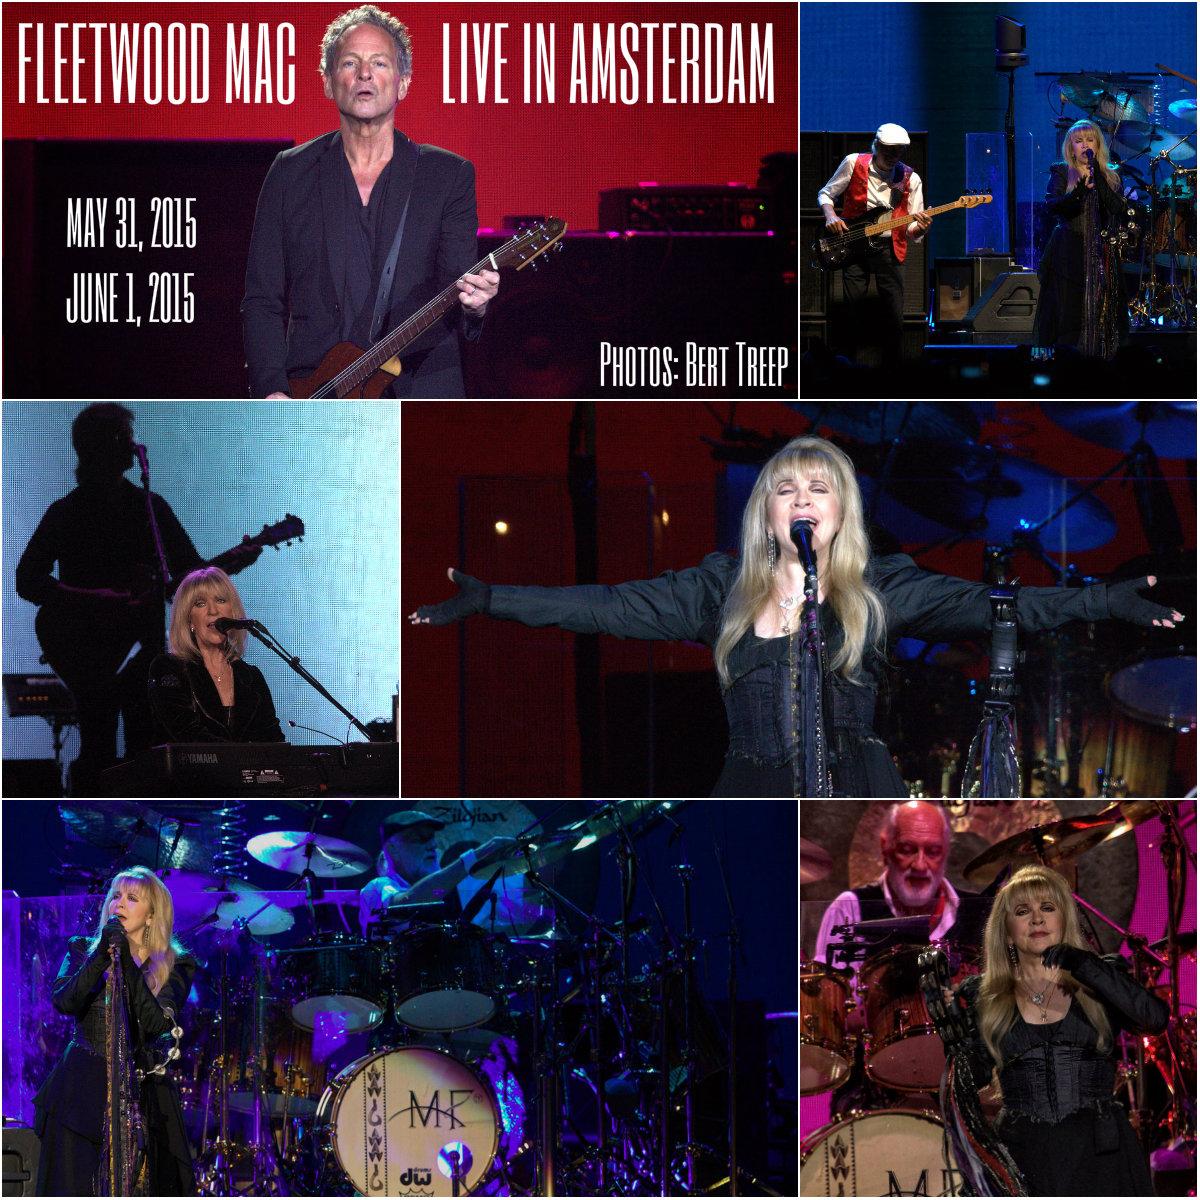 fleetwood mac live tour 2013